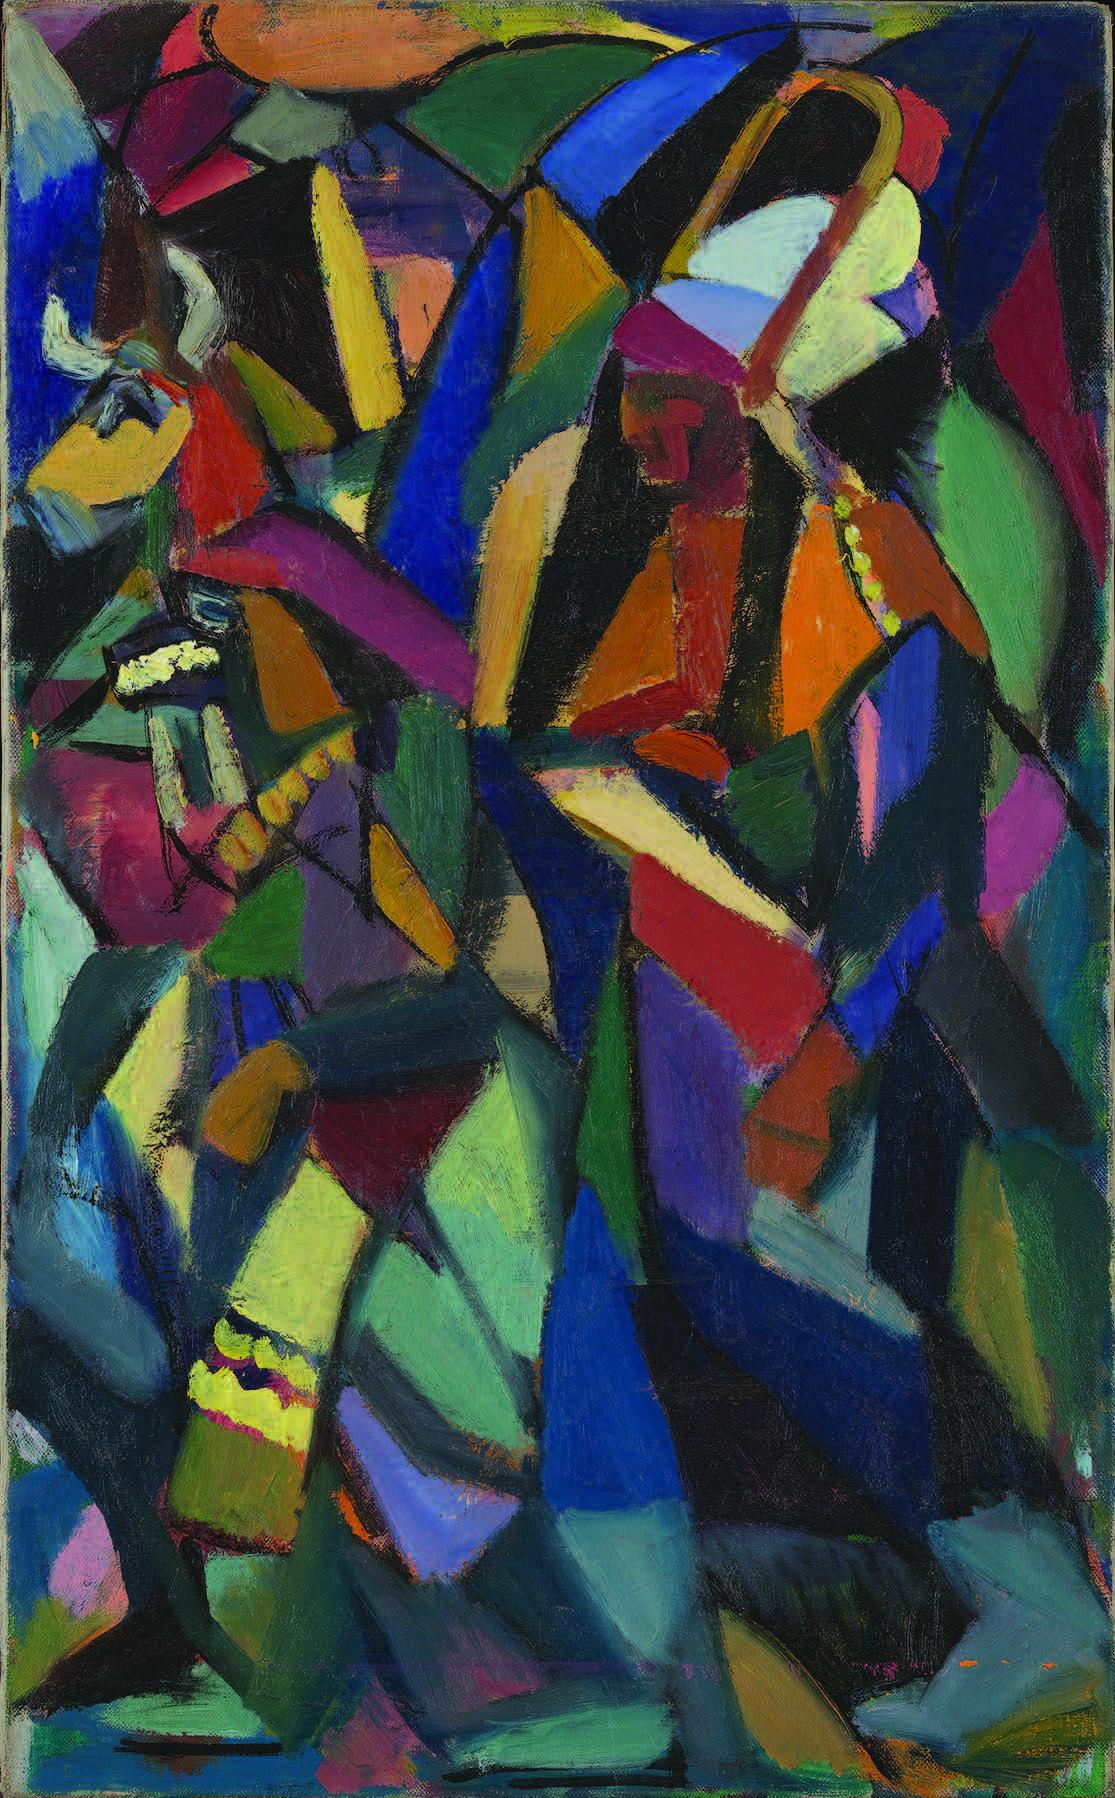 Jan Matulka (1890–1972), Indian Dancers, ca. 1917–18. Oil on canvas, 26 × 16 in. (66 × 40.6 cm). The Jan T. and Marica Vilcek Collection. © Estate of Jan Matulka.